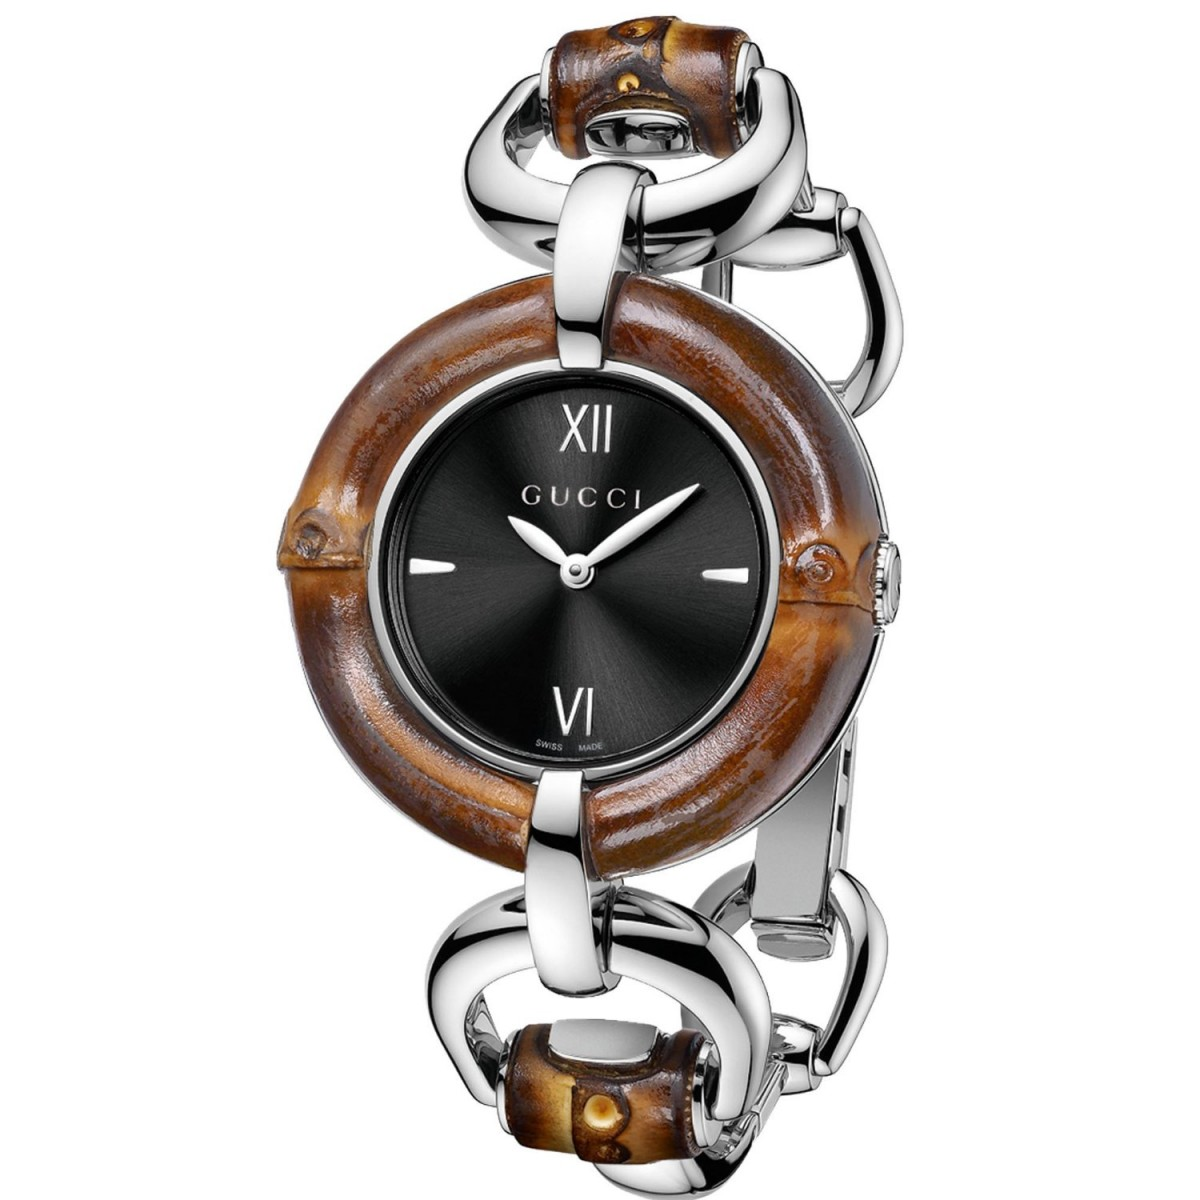 b0b20b6ac Compre Relógio Gucci Bamboo em 10X | Tri-Jóia Shop